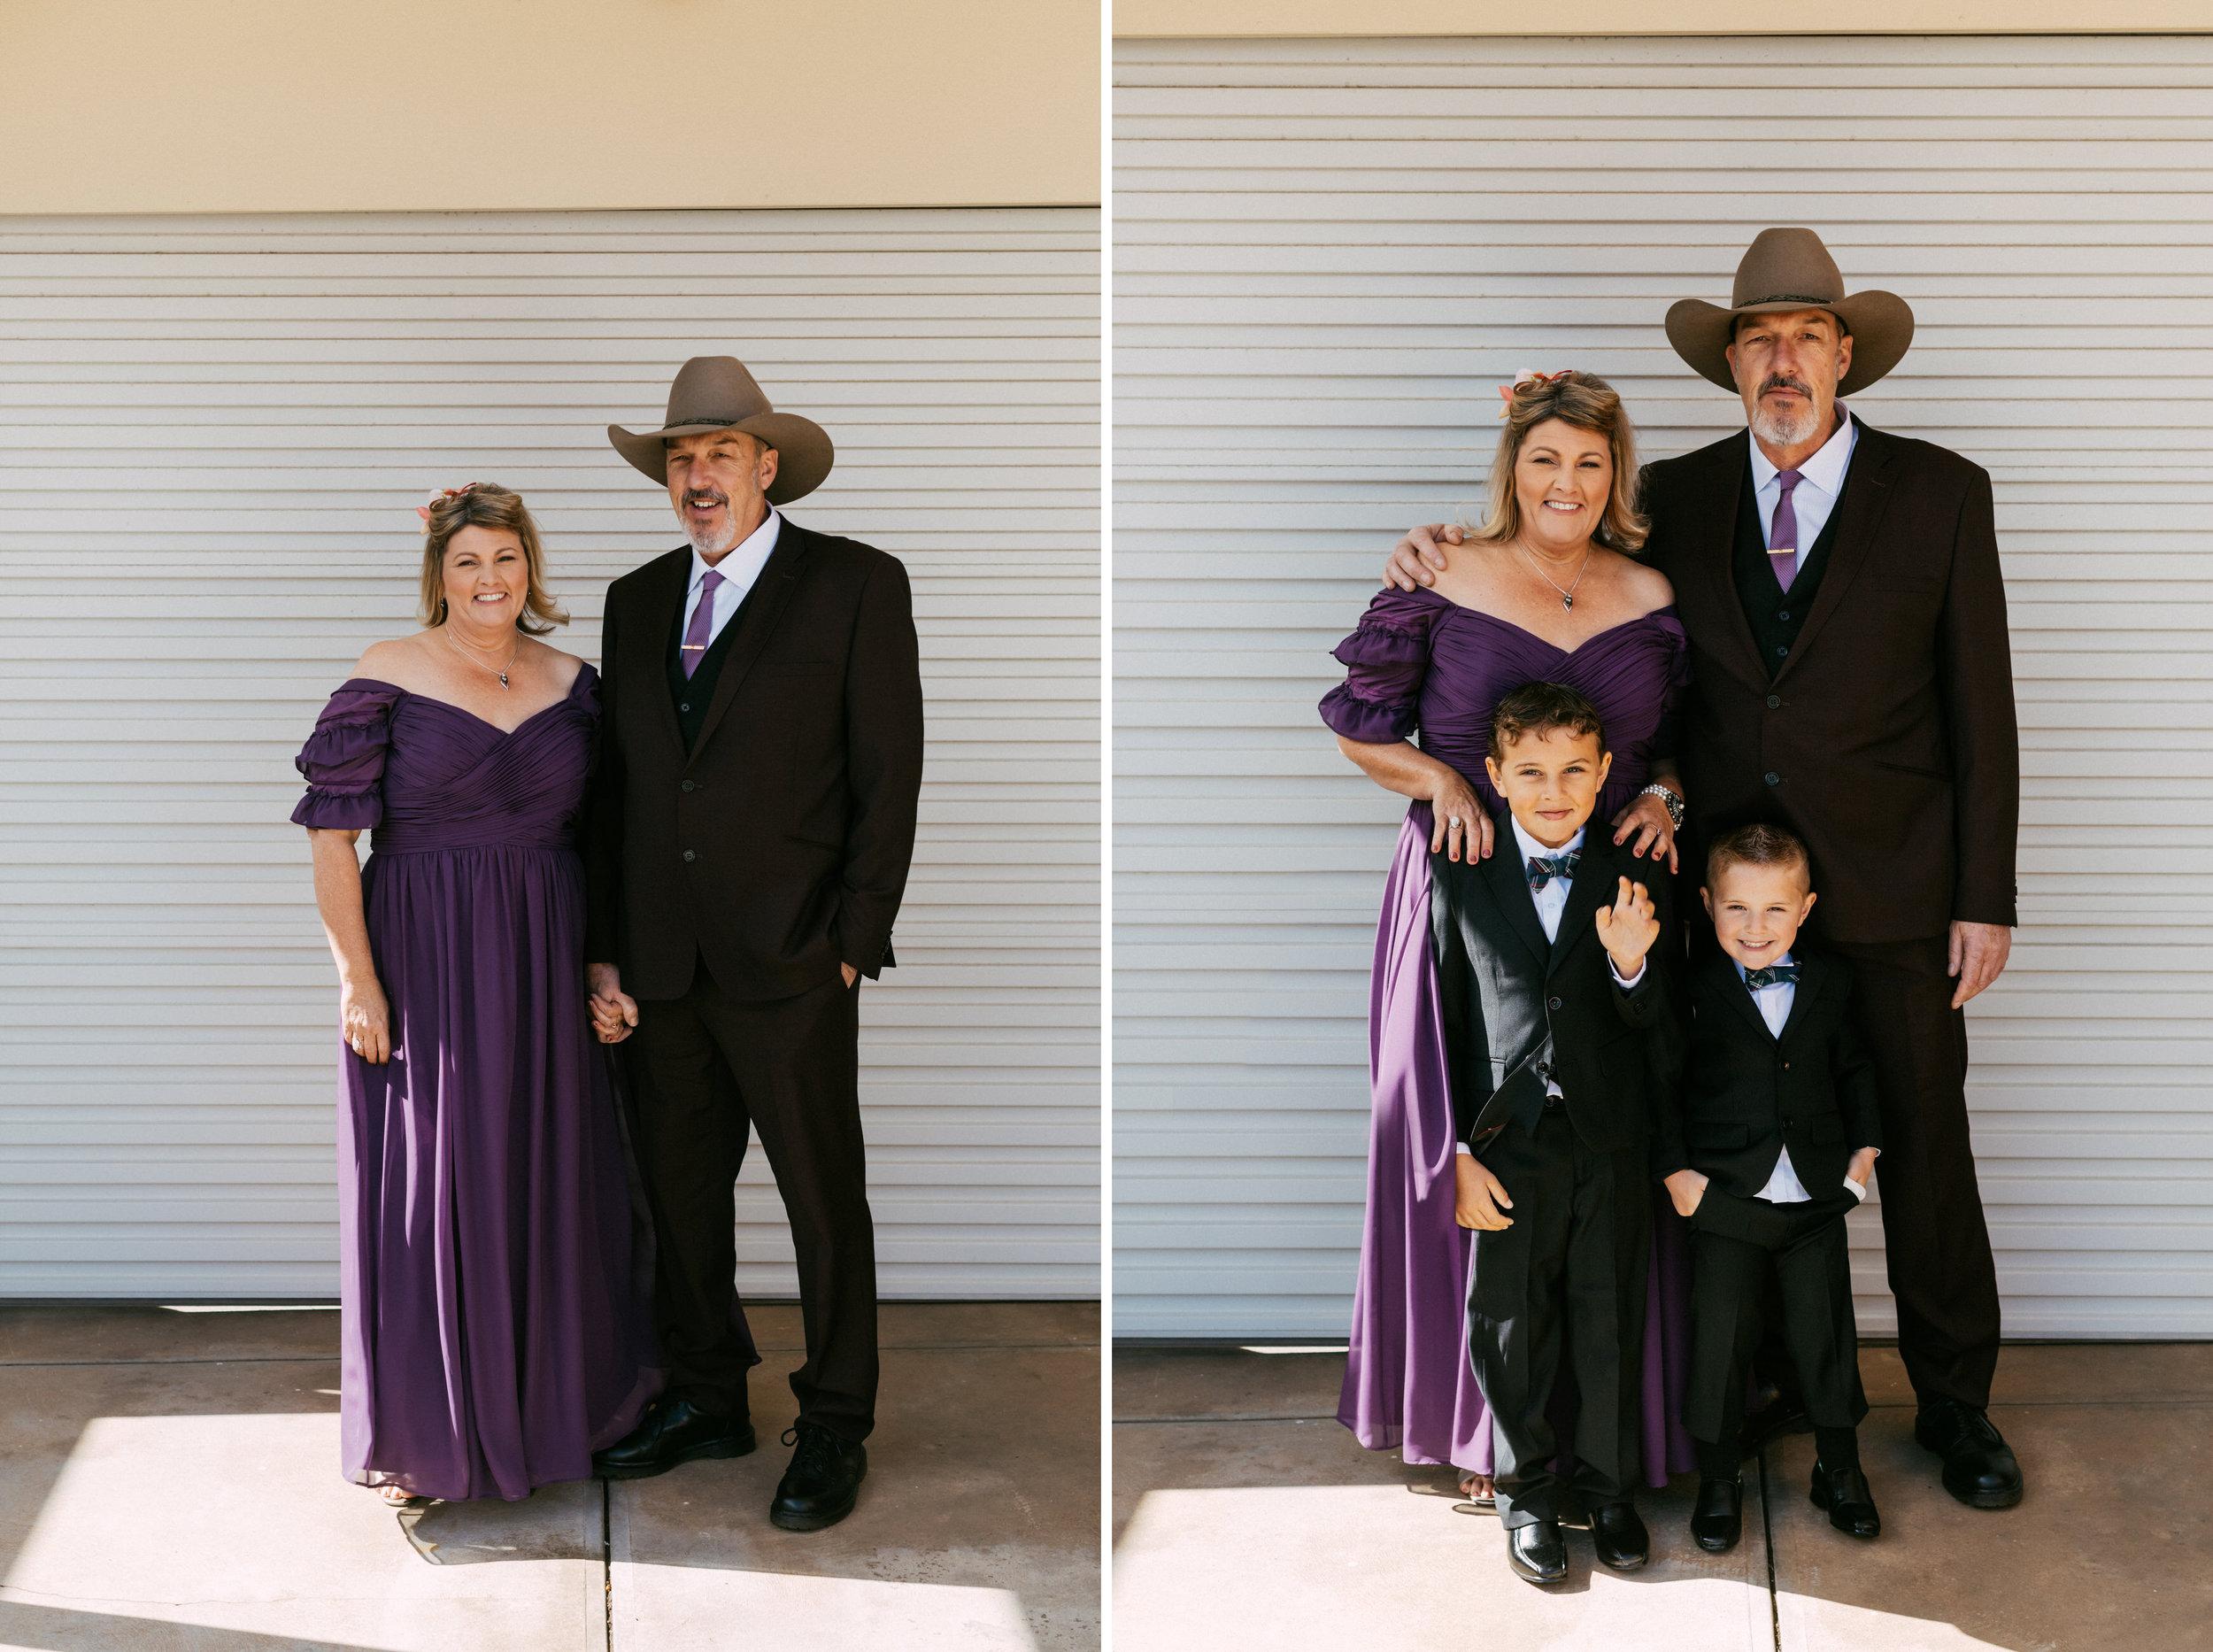 Adelaide Wedding Church Smoke Bomb Serafino 018.jpg